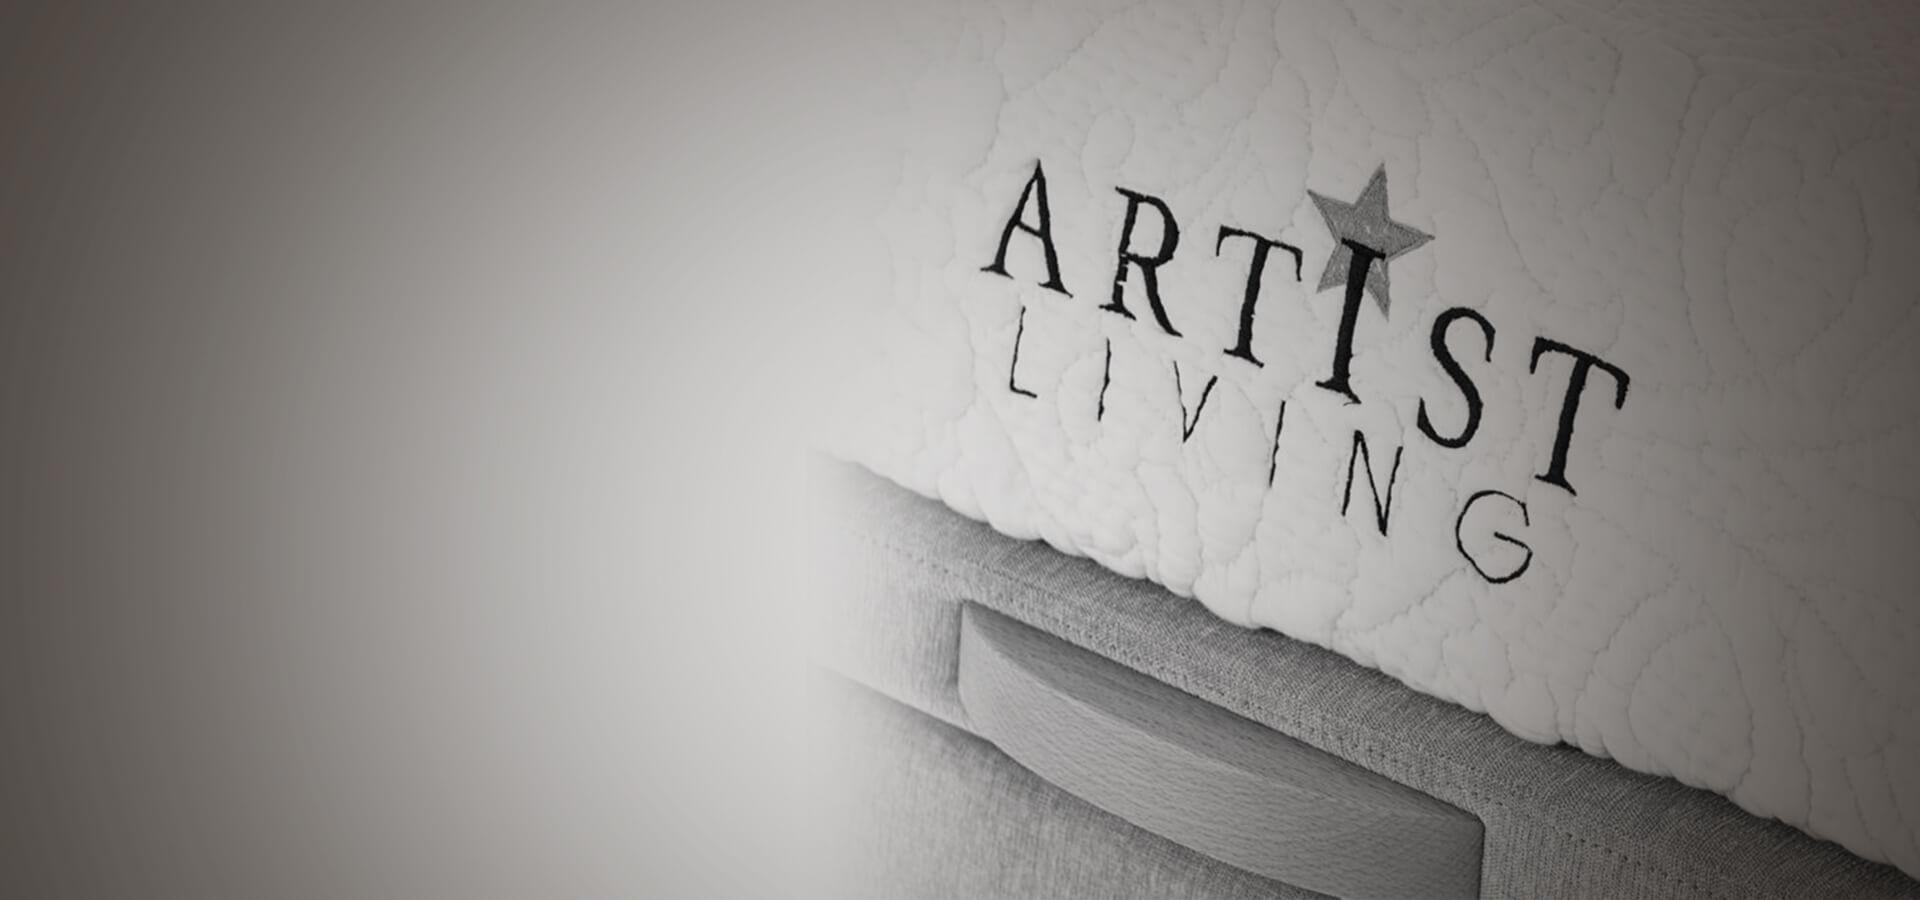 artist-living-product-header-04